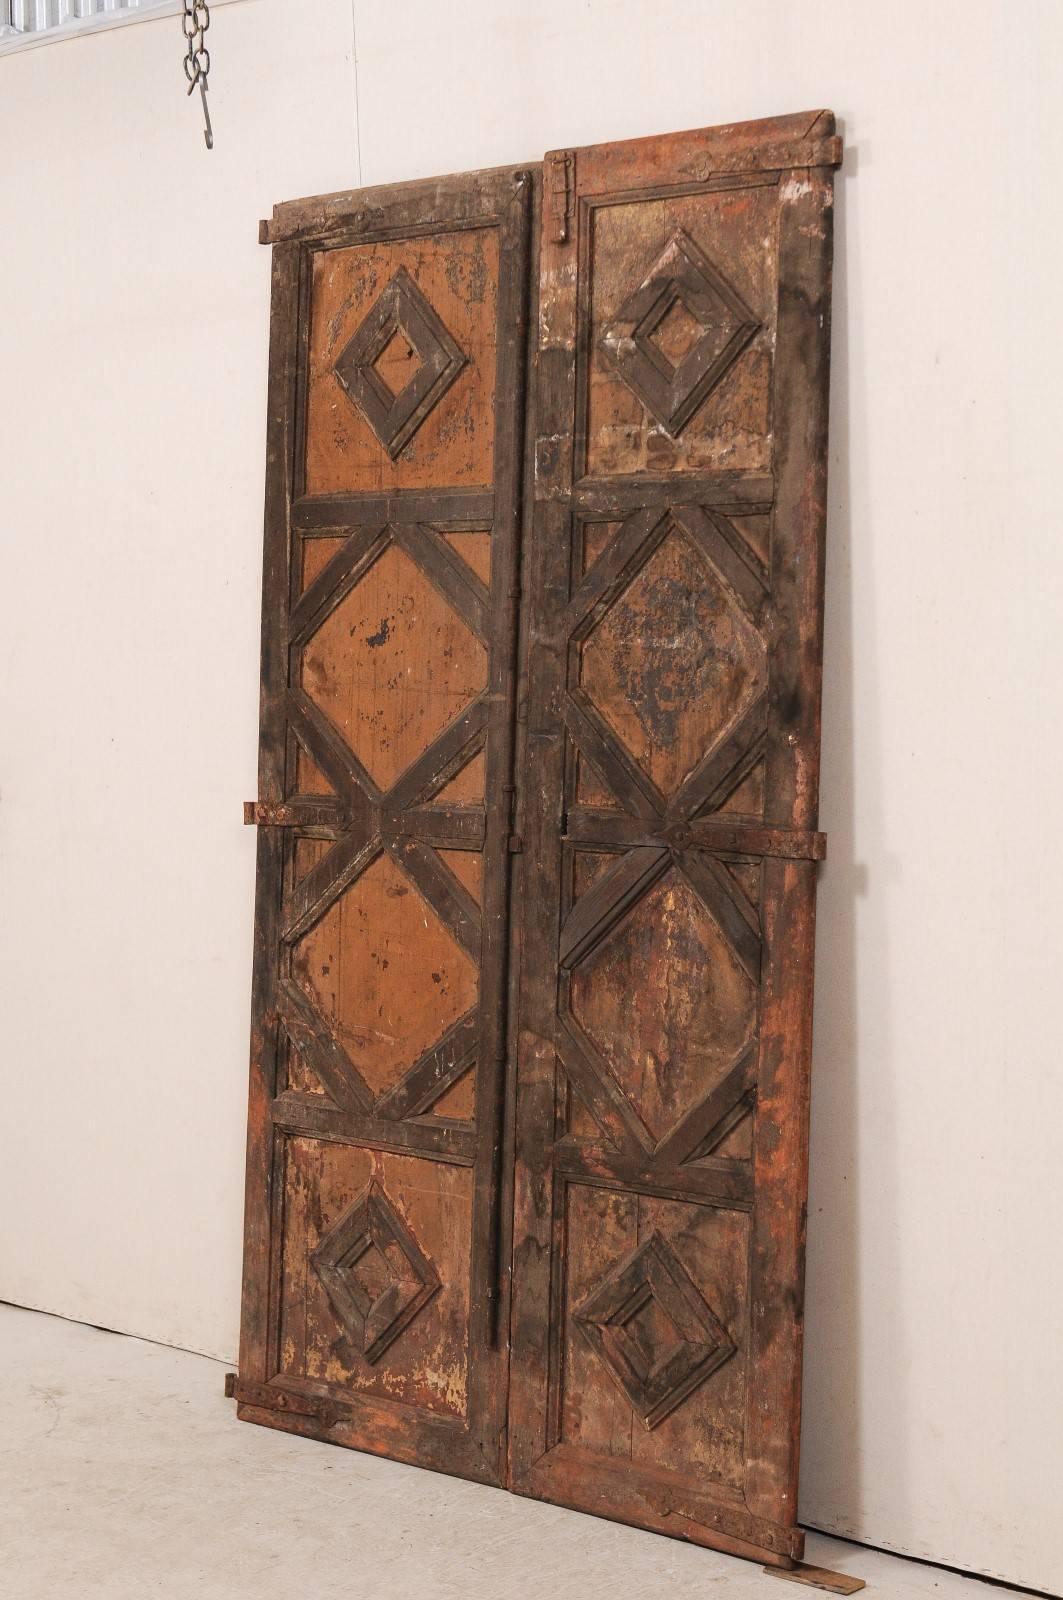 A Pair Of 18th Century Spanish Wood Doors. This Pair Of Antique Spanish  Doors Feature